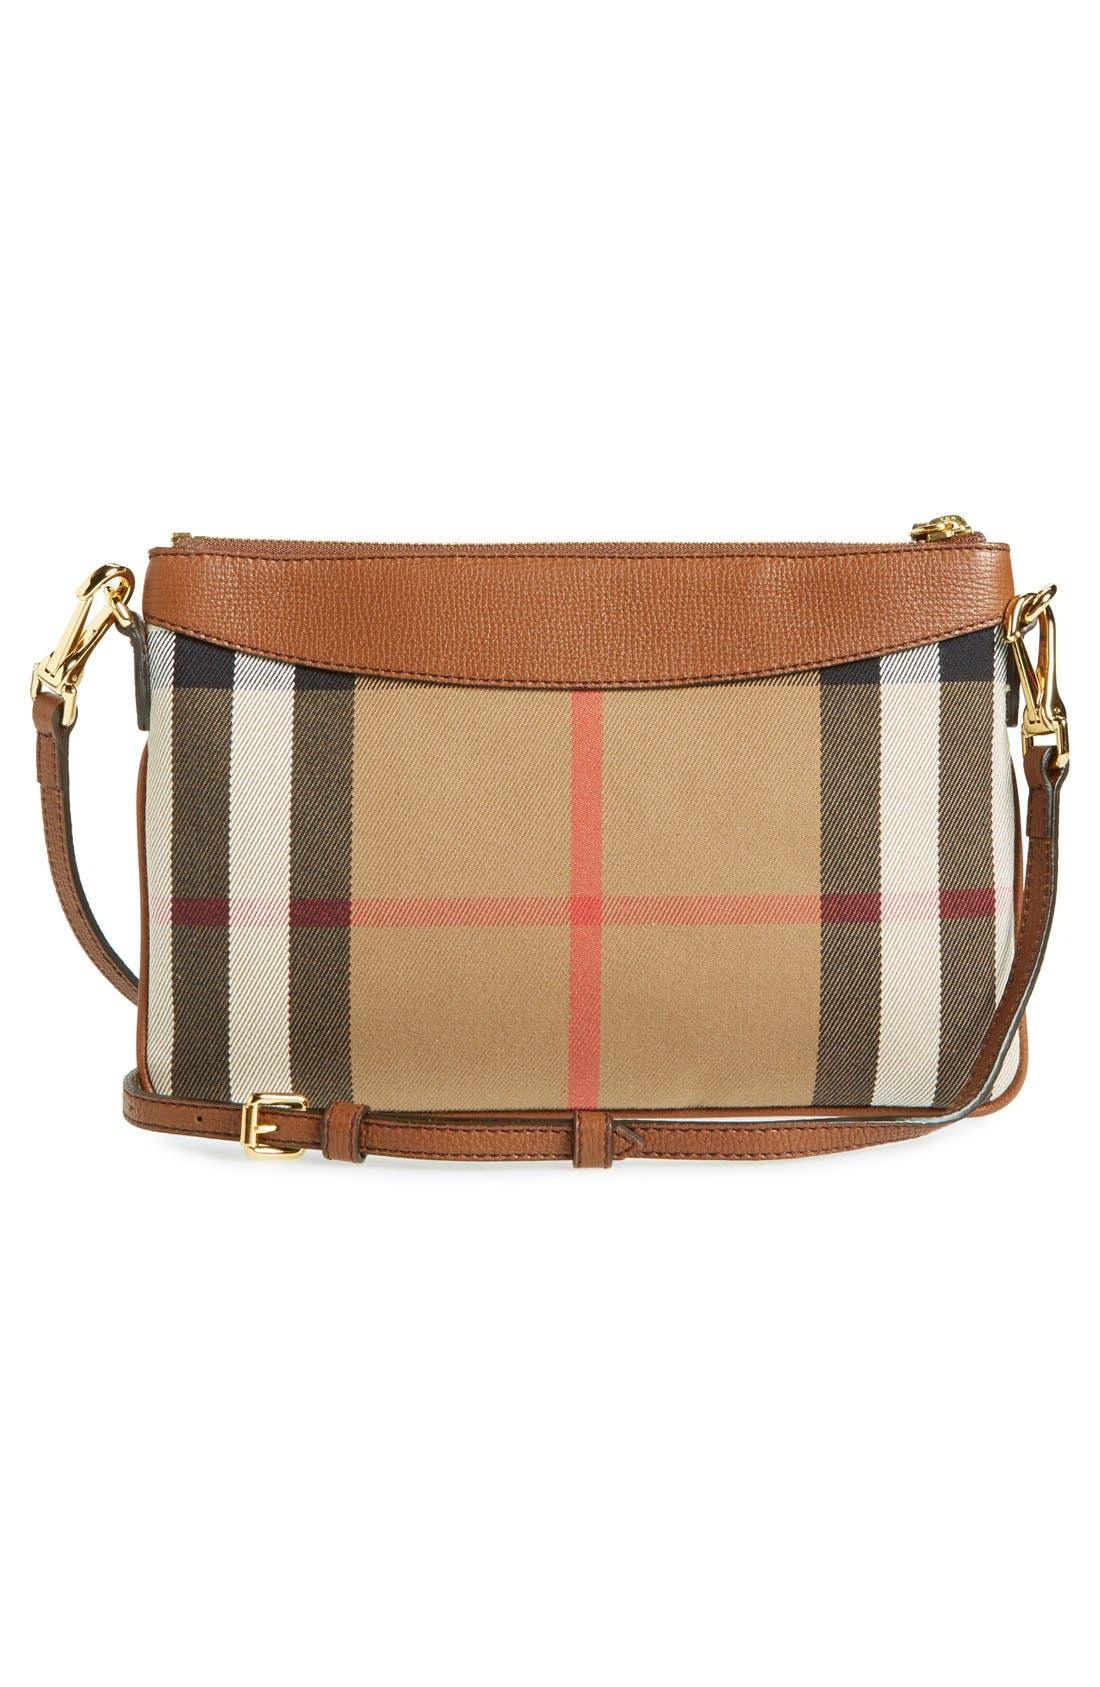 'Peyton - House Check' Crossbody Bag,                             Alternate thumbnail 6, color,                             250